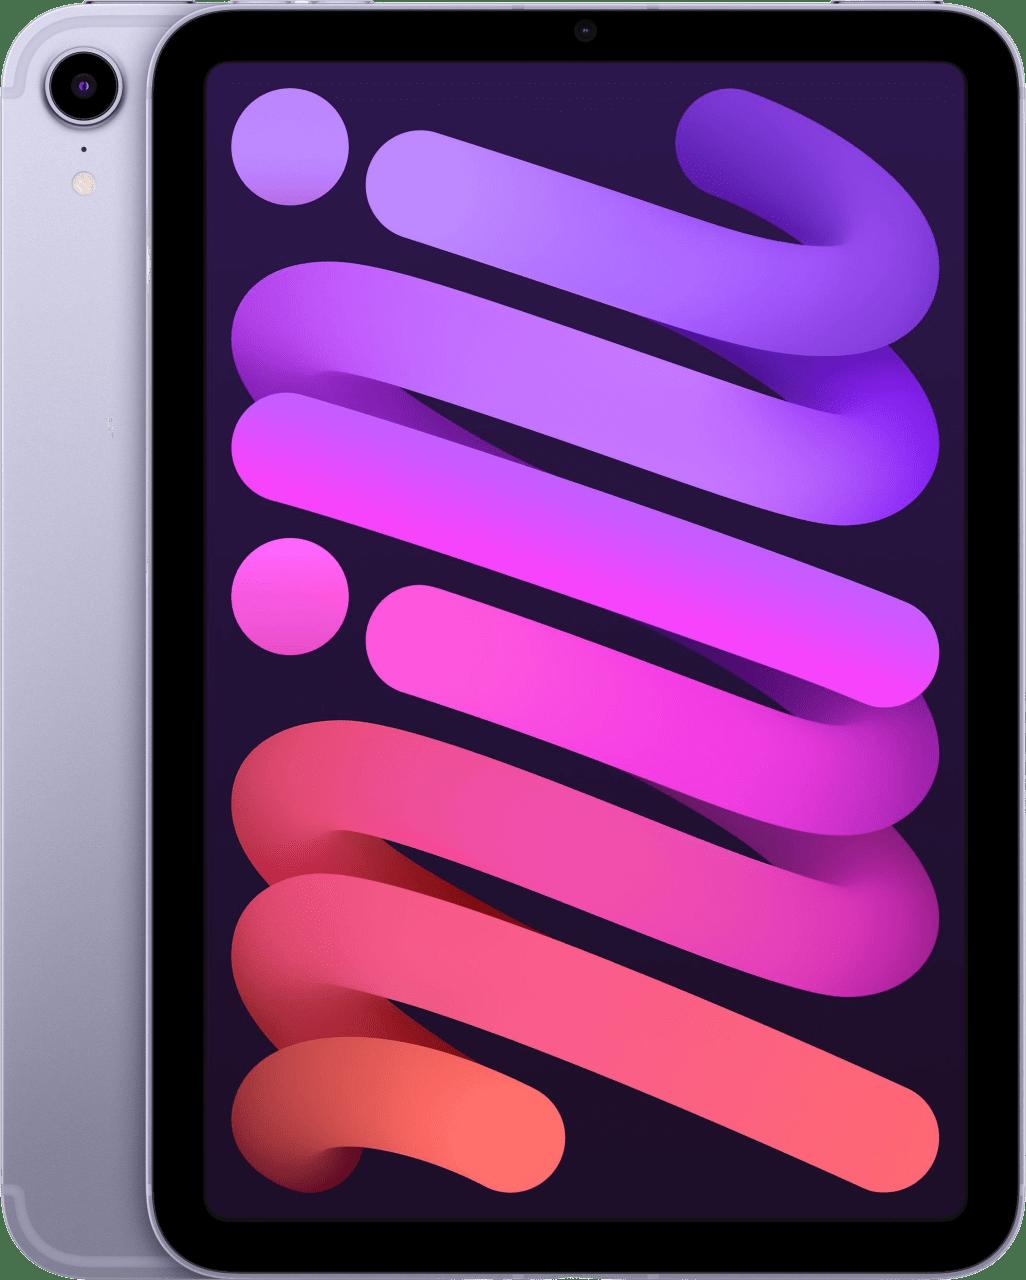 Purple Apple iPad mini (2021) - WiFi - iOS 15 - 64GB.1